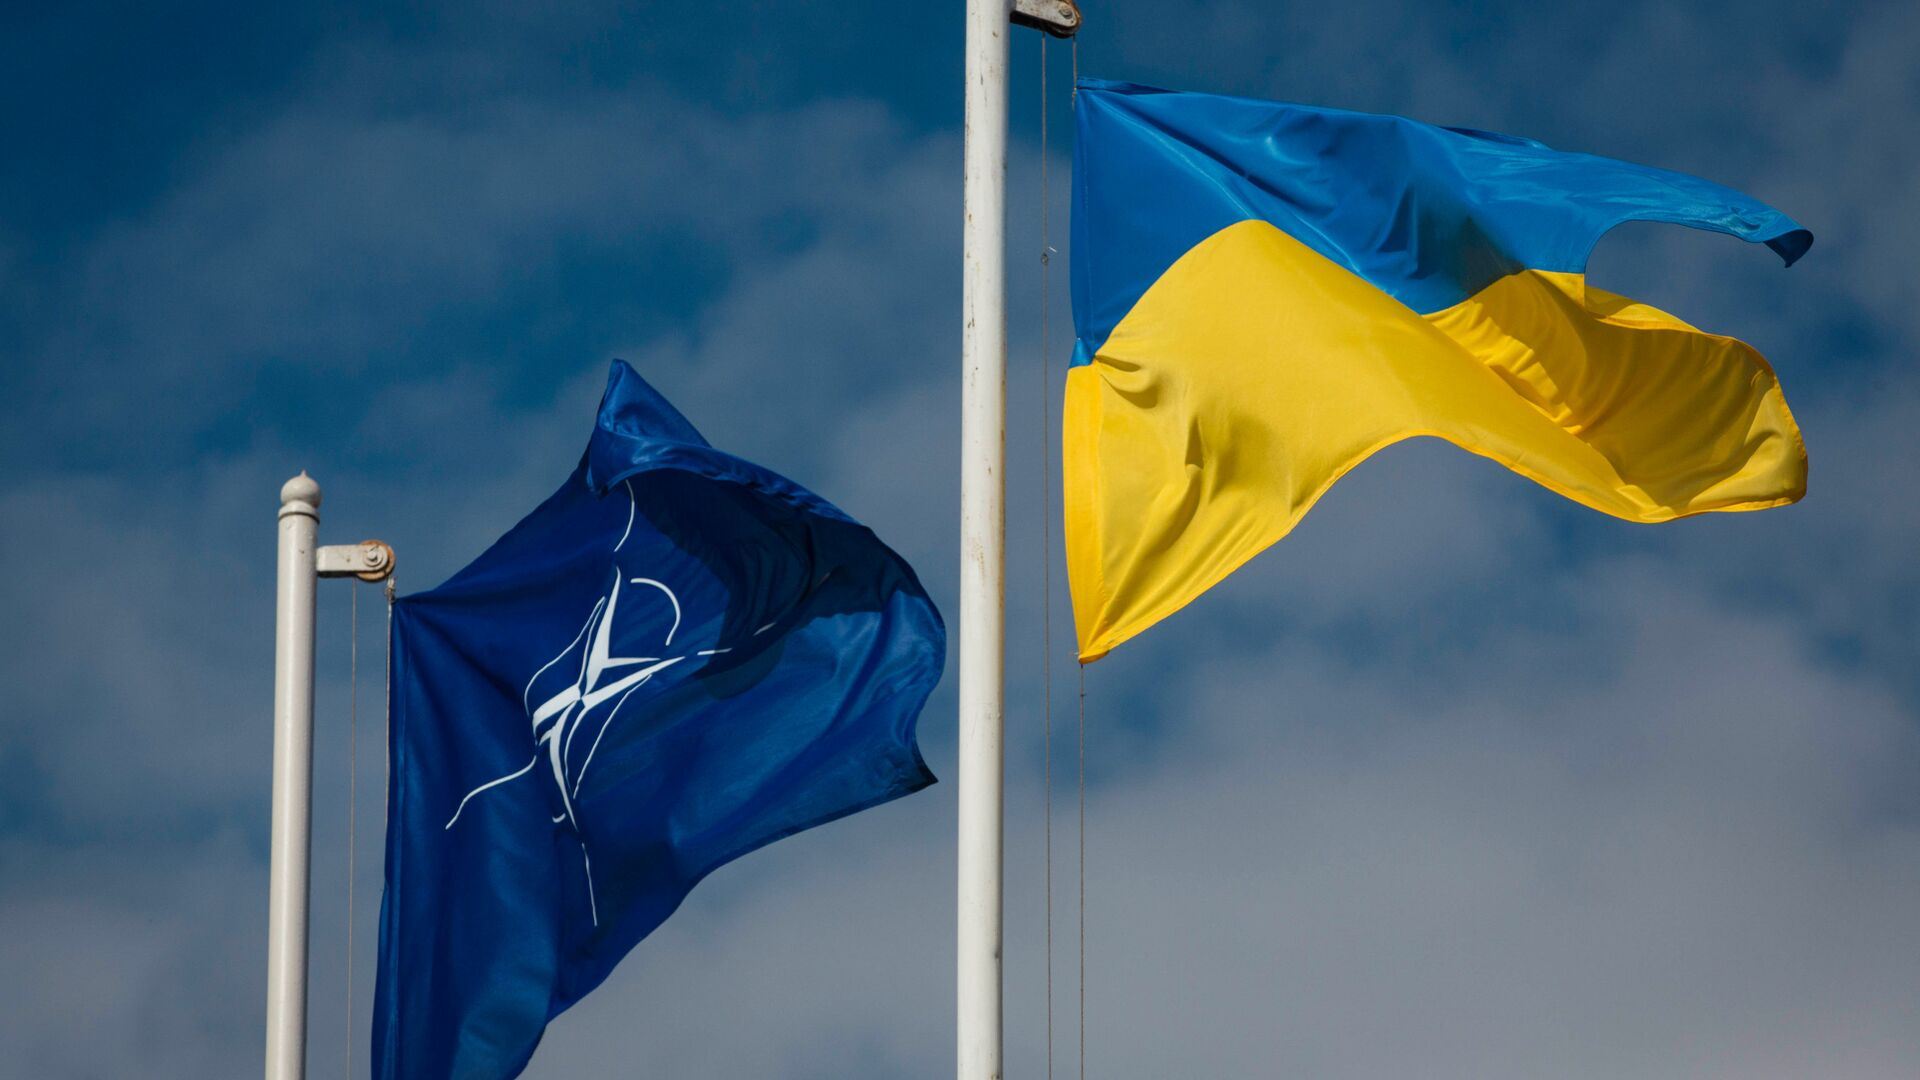 Las banderas de la OTAN y Ucrania - Sputnik Mundo, 1920, 18.06.2021